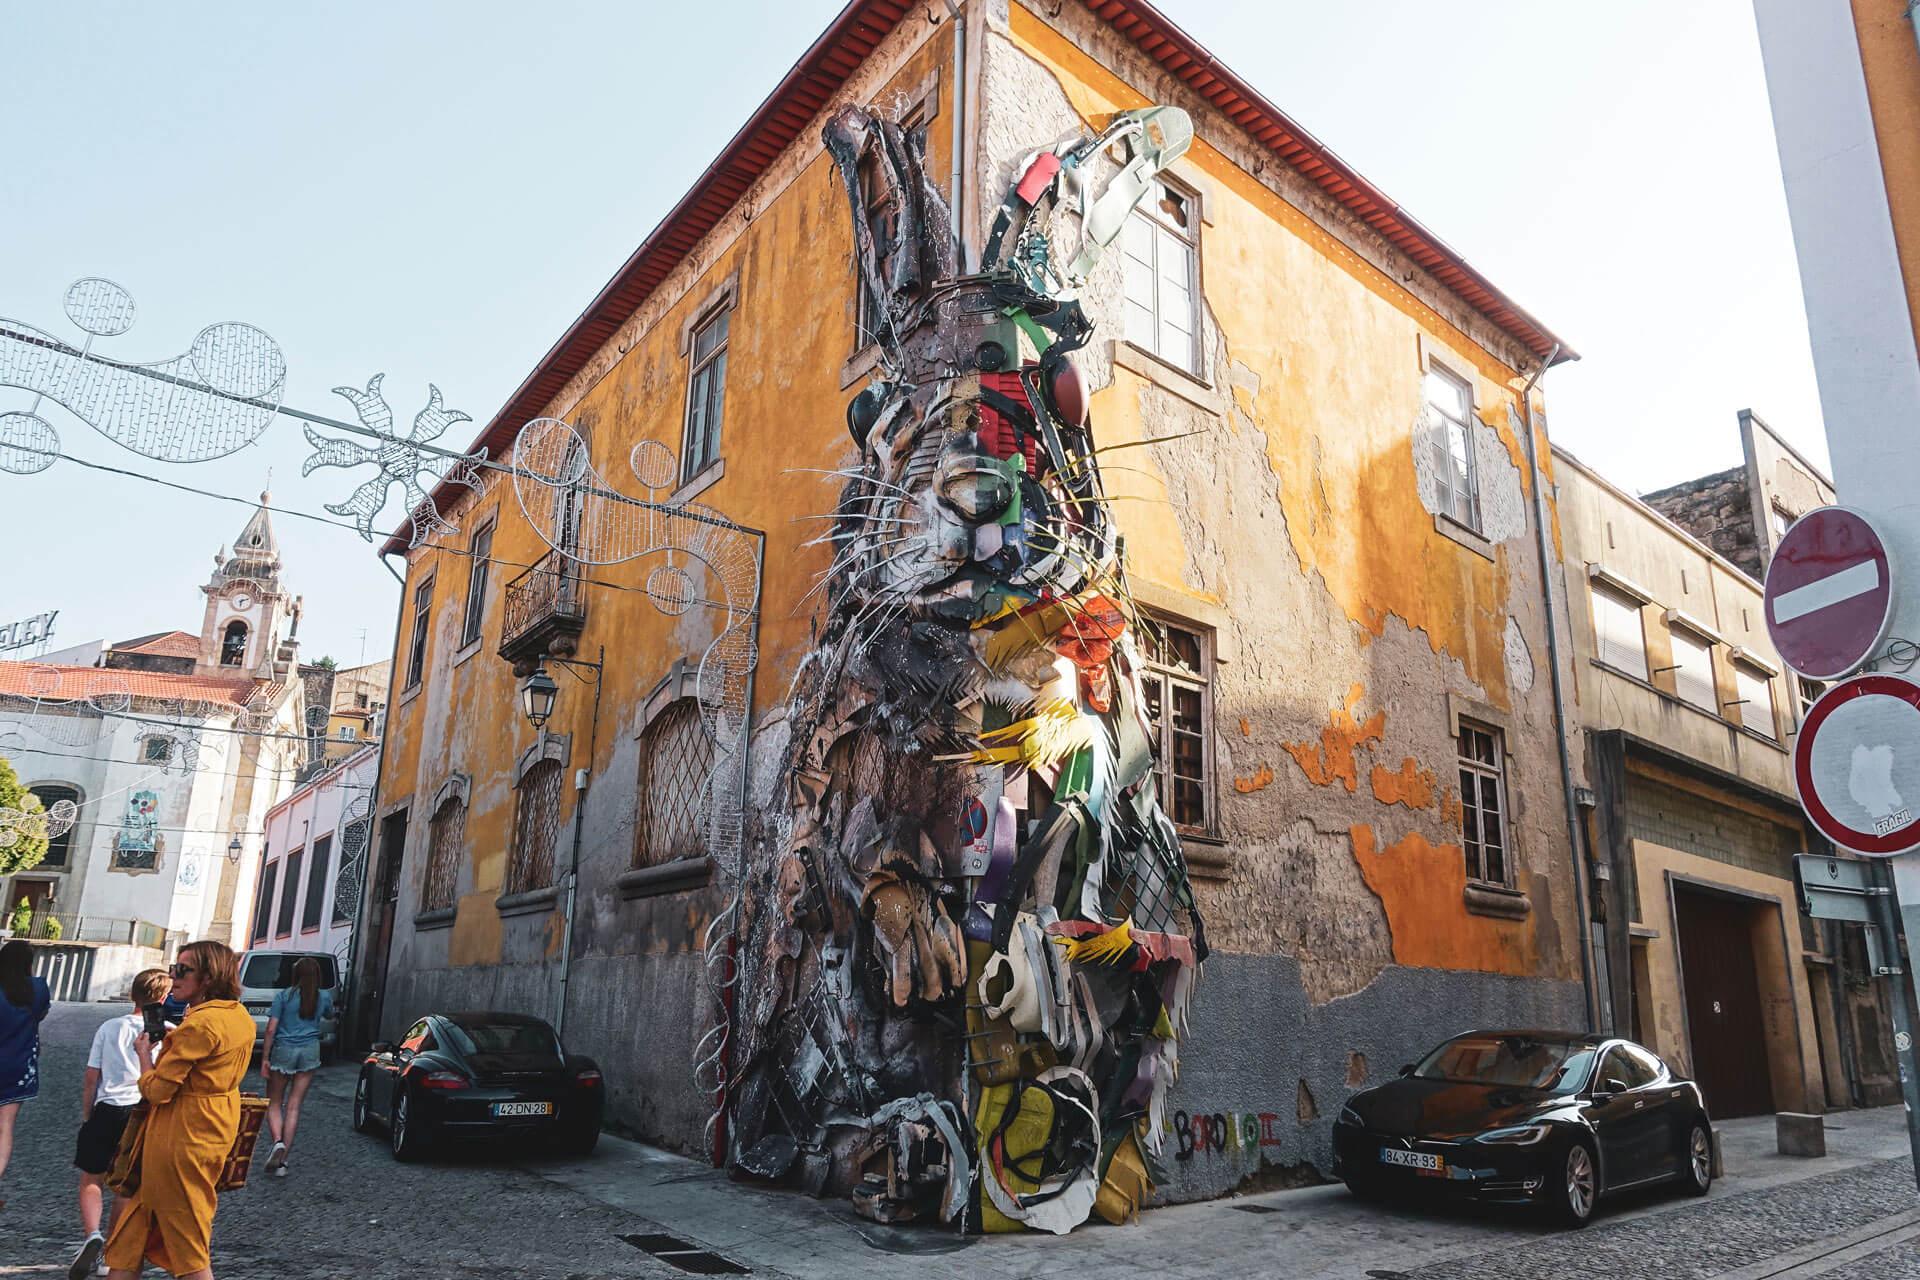 Streetart in Gaia - Hase